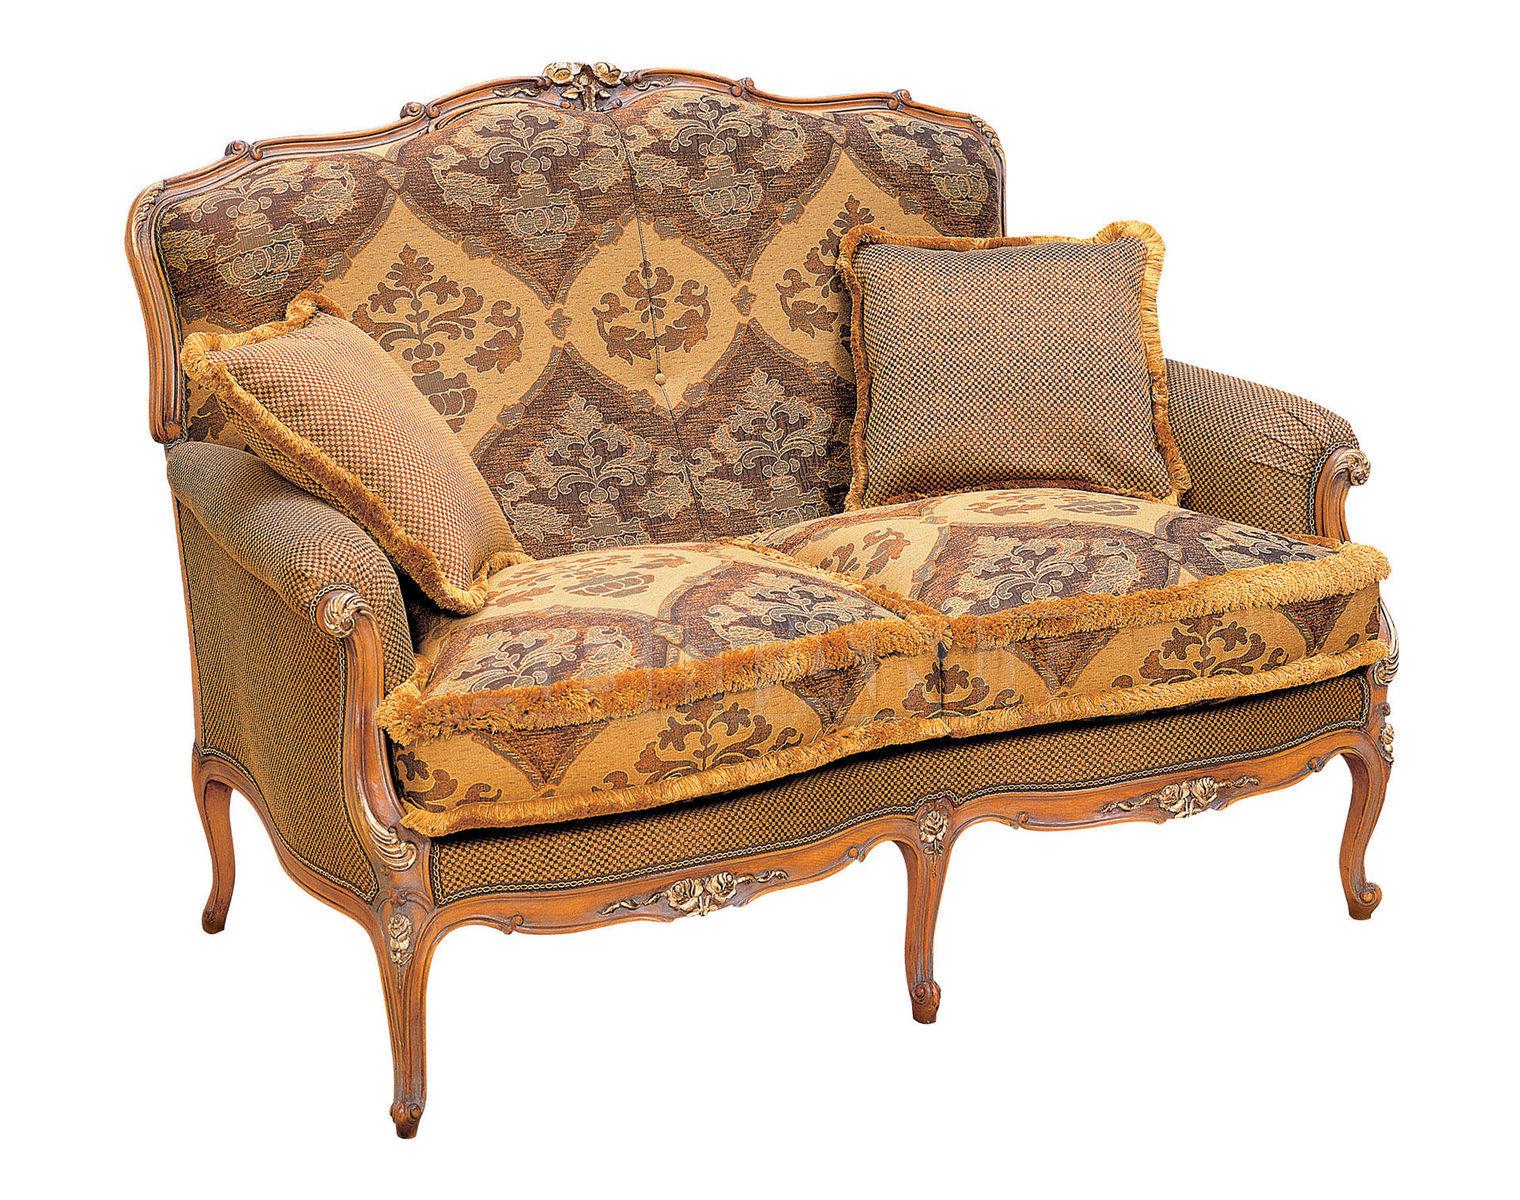 Купить Канапе Stil Salotti di Origgi Luigi e Figli s.n.c. Origgi Flower 2 seats